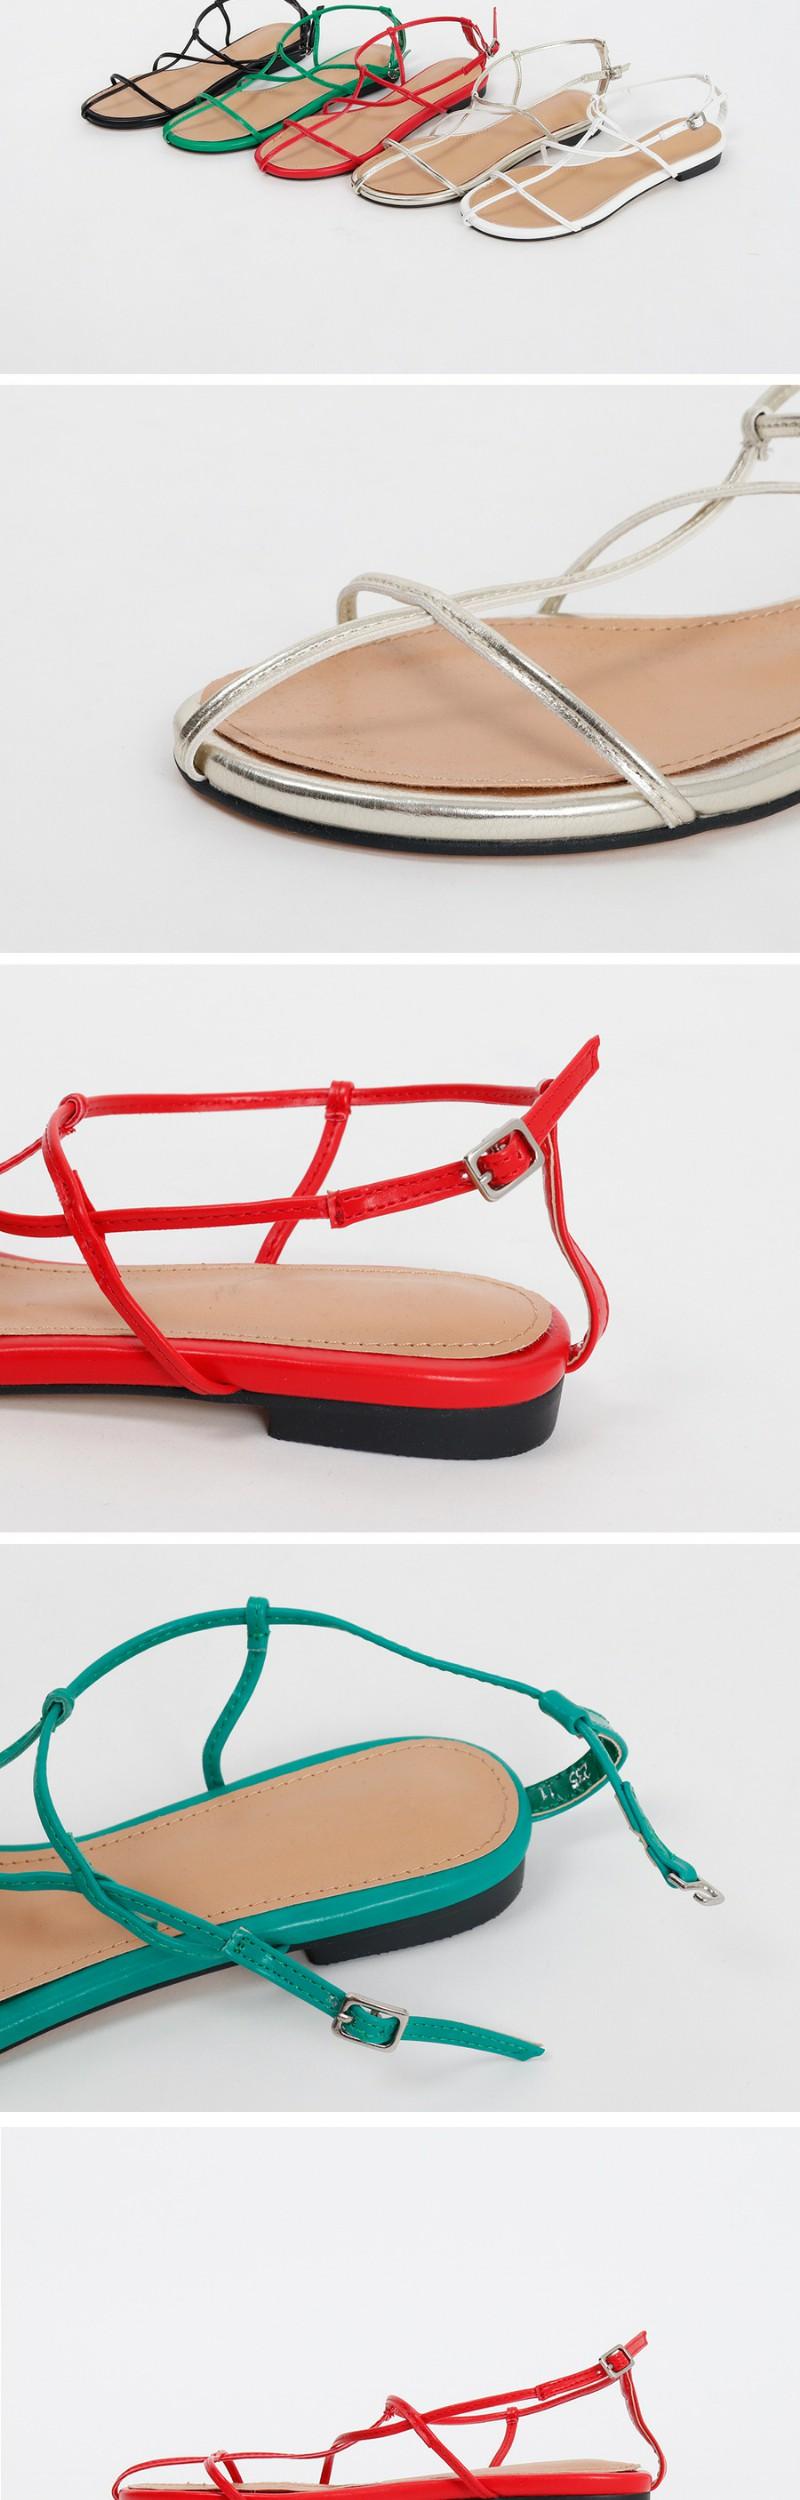 City string color sandal_S (size : 230,235,240,245,250)